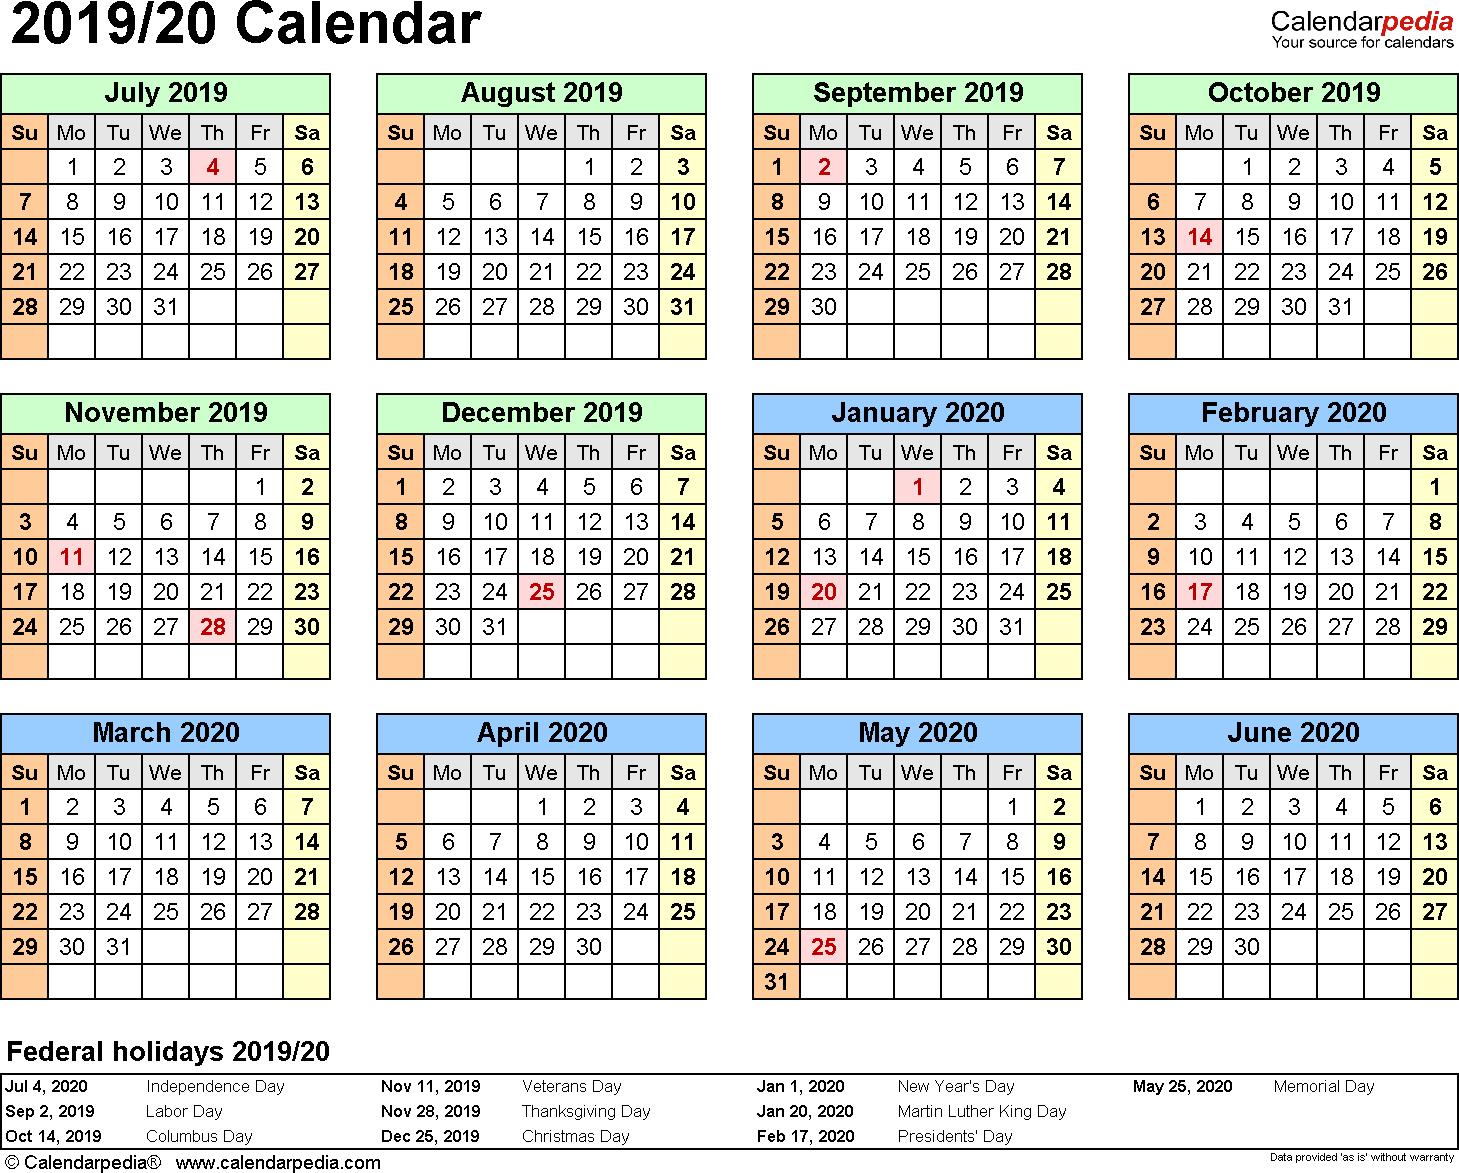 Split Year Calendar 2019/20 (July To June) - Pdf Templates inside Free Calendar July 2019-June 2020